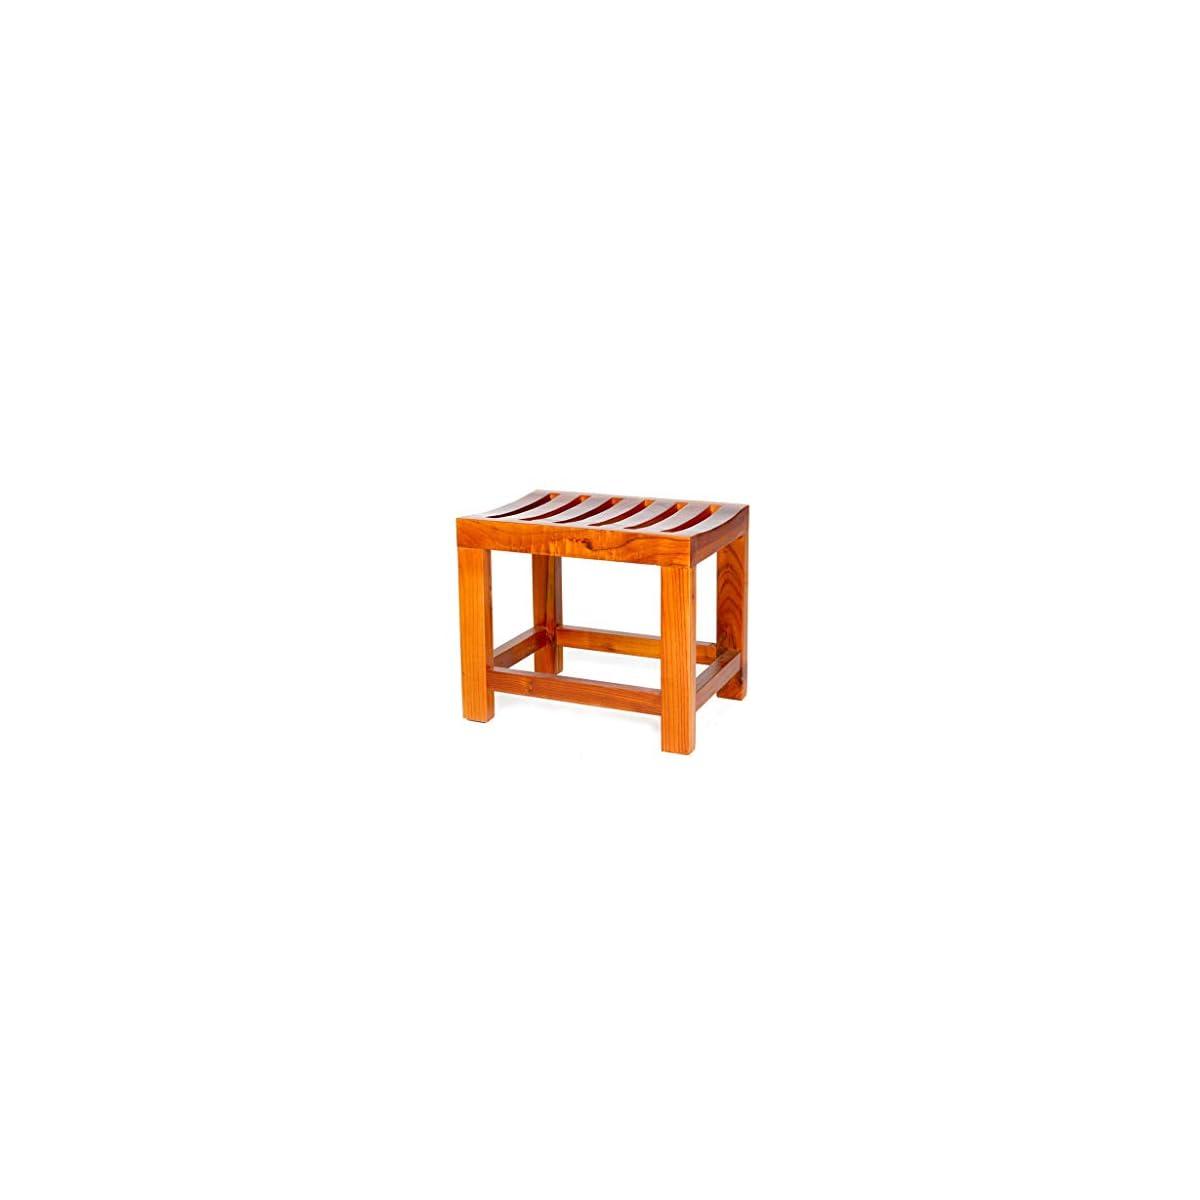 41Ao5N gn%2BL. SS1200  - Jiaz Muebles/estante/estante de almacenamiento Taburete de ducha con marco de bambú con estante Taburete de baño Taburete Adecuado para uso en interiores o exteriores